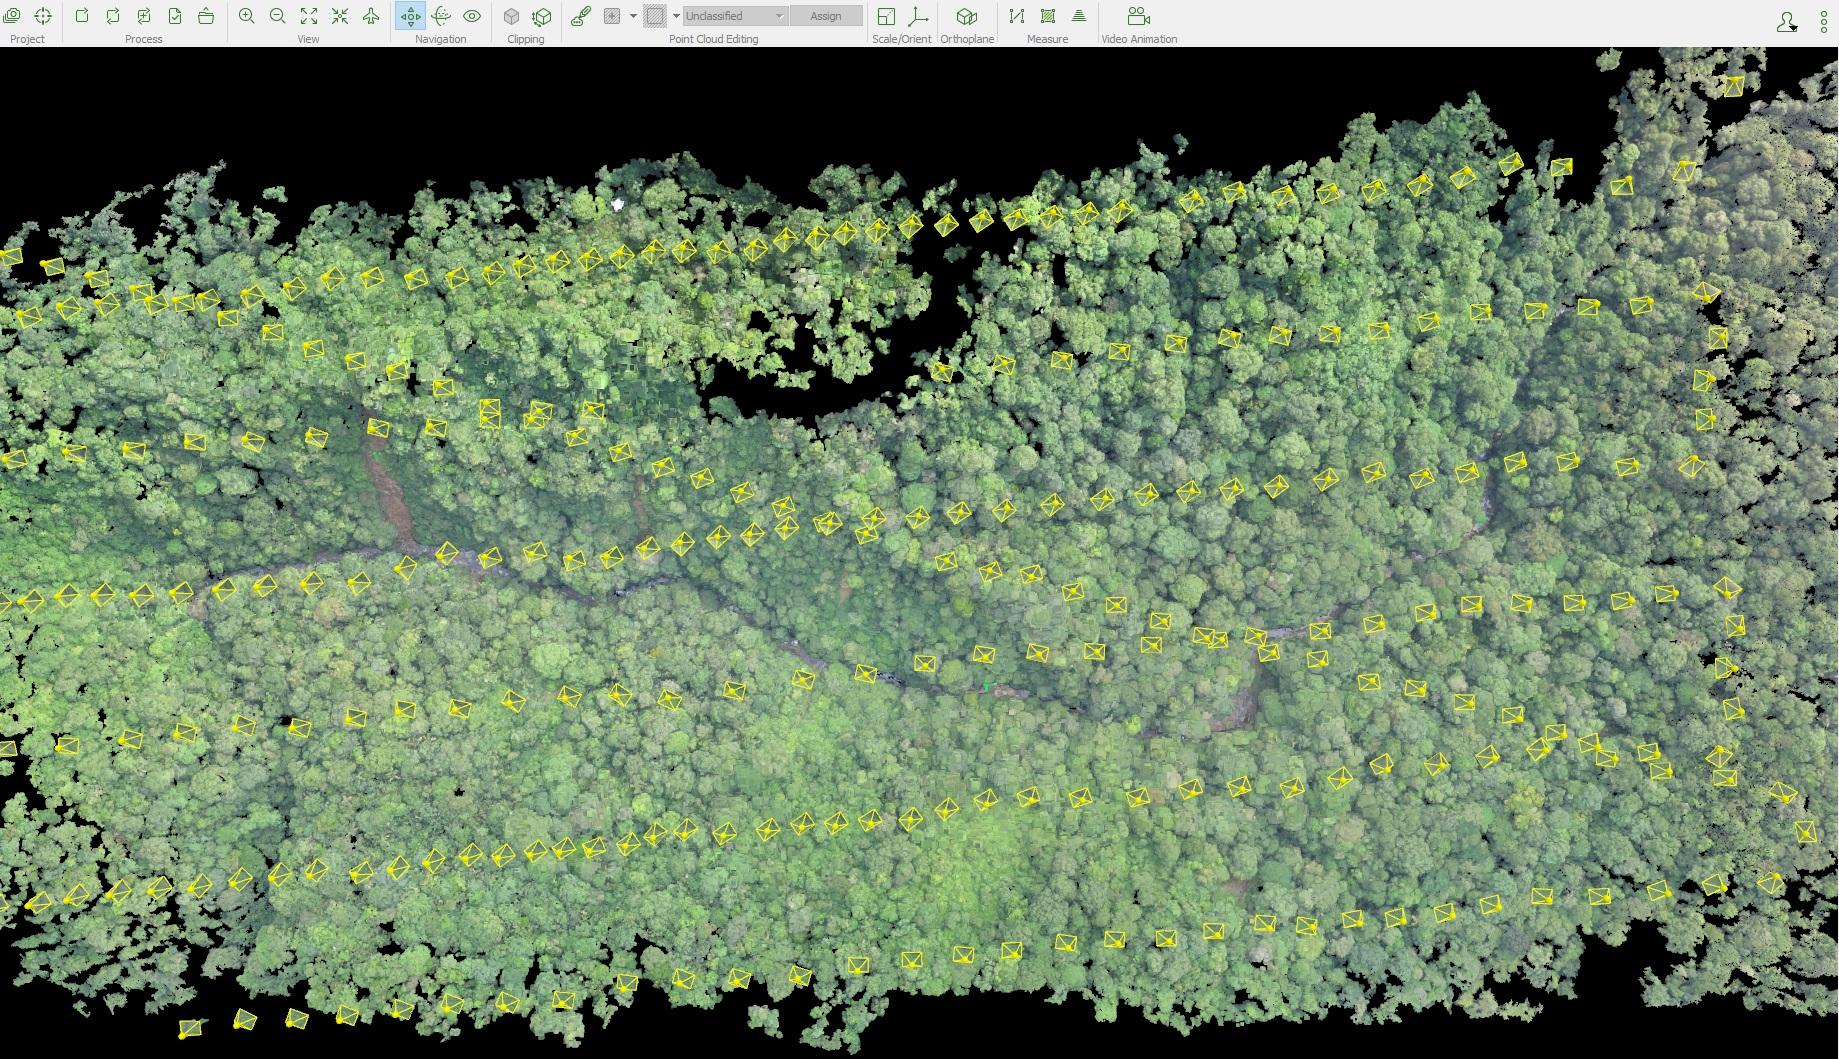 UAV monitoring to preserving endangered spider monkeys | Pix4D